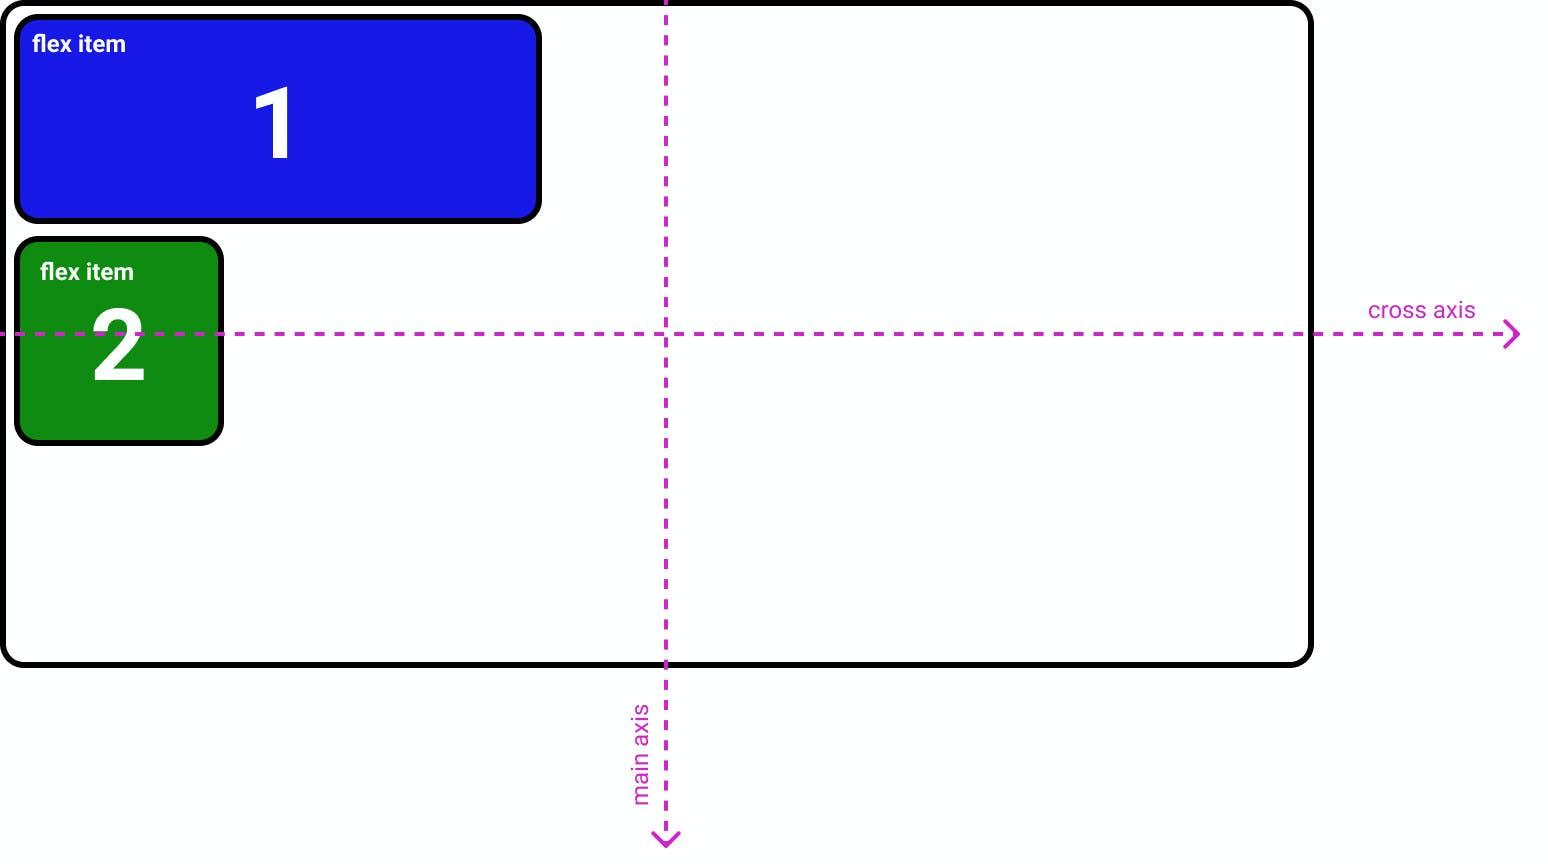 CSS flexbox flex-direction: column;